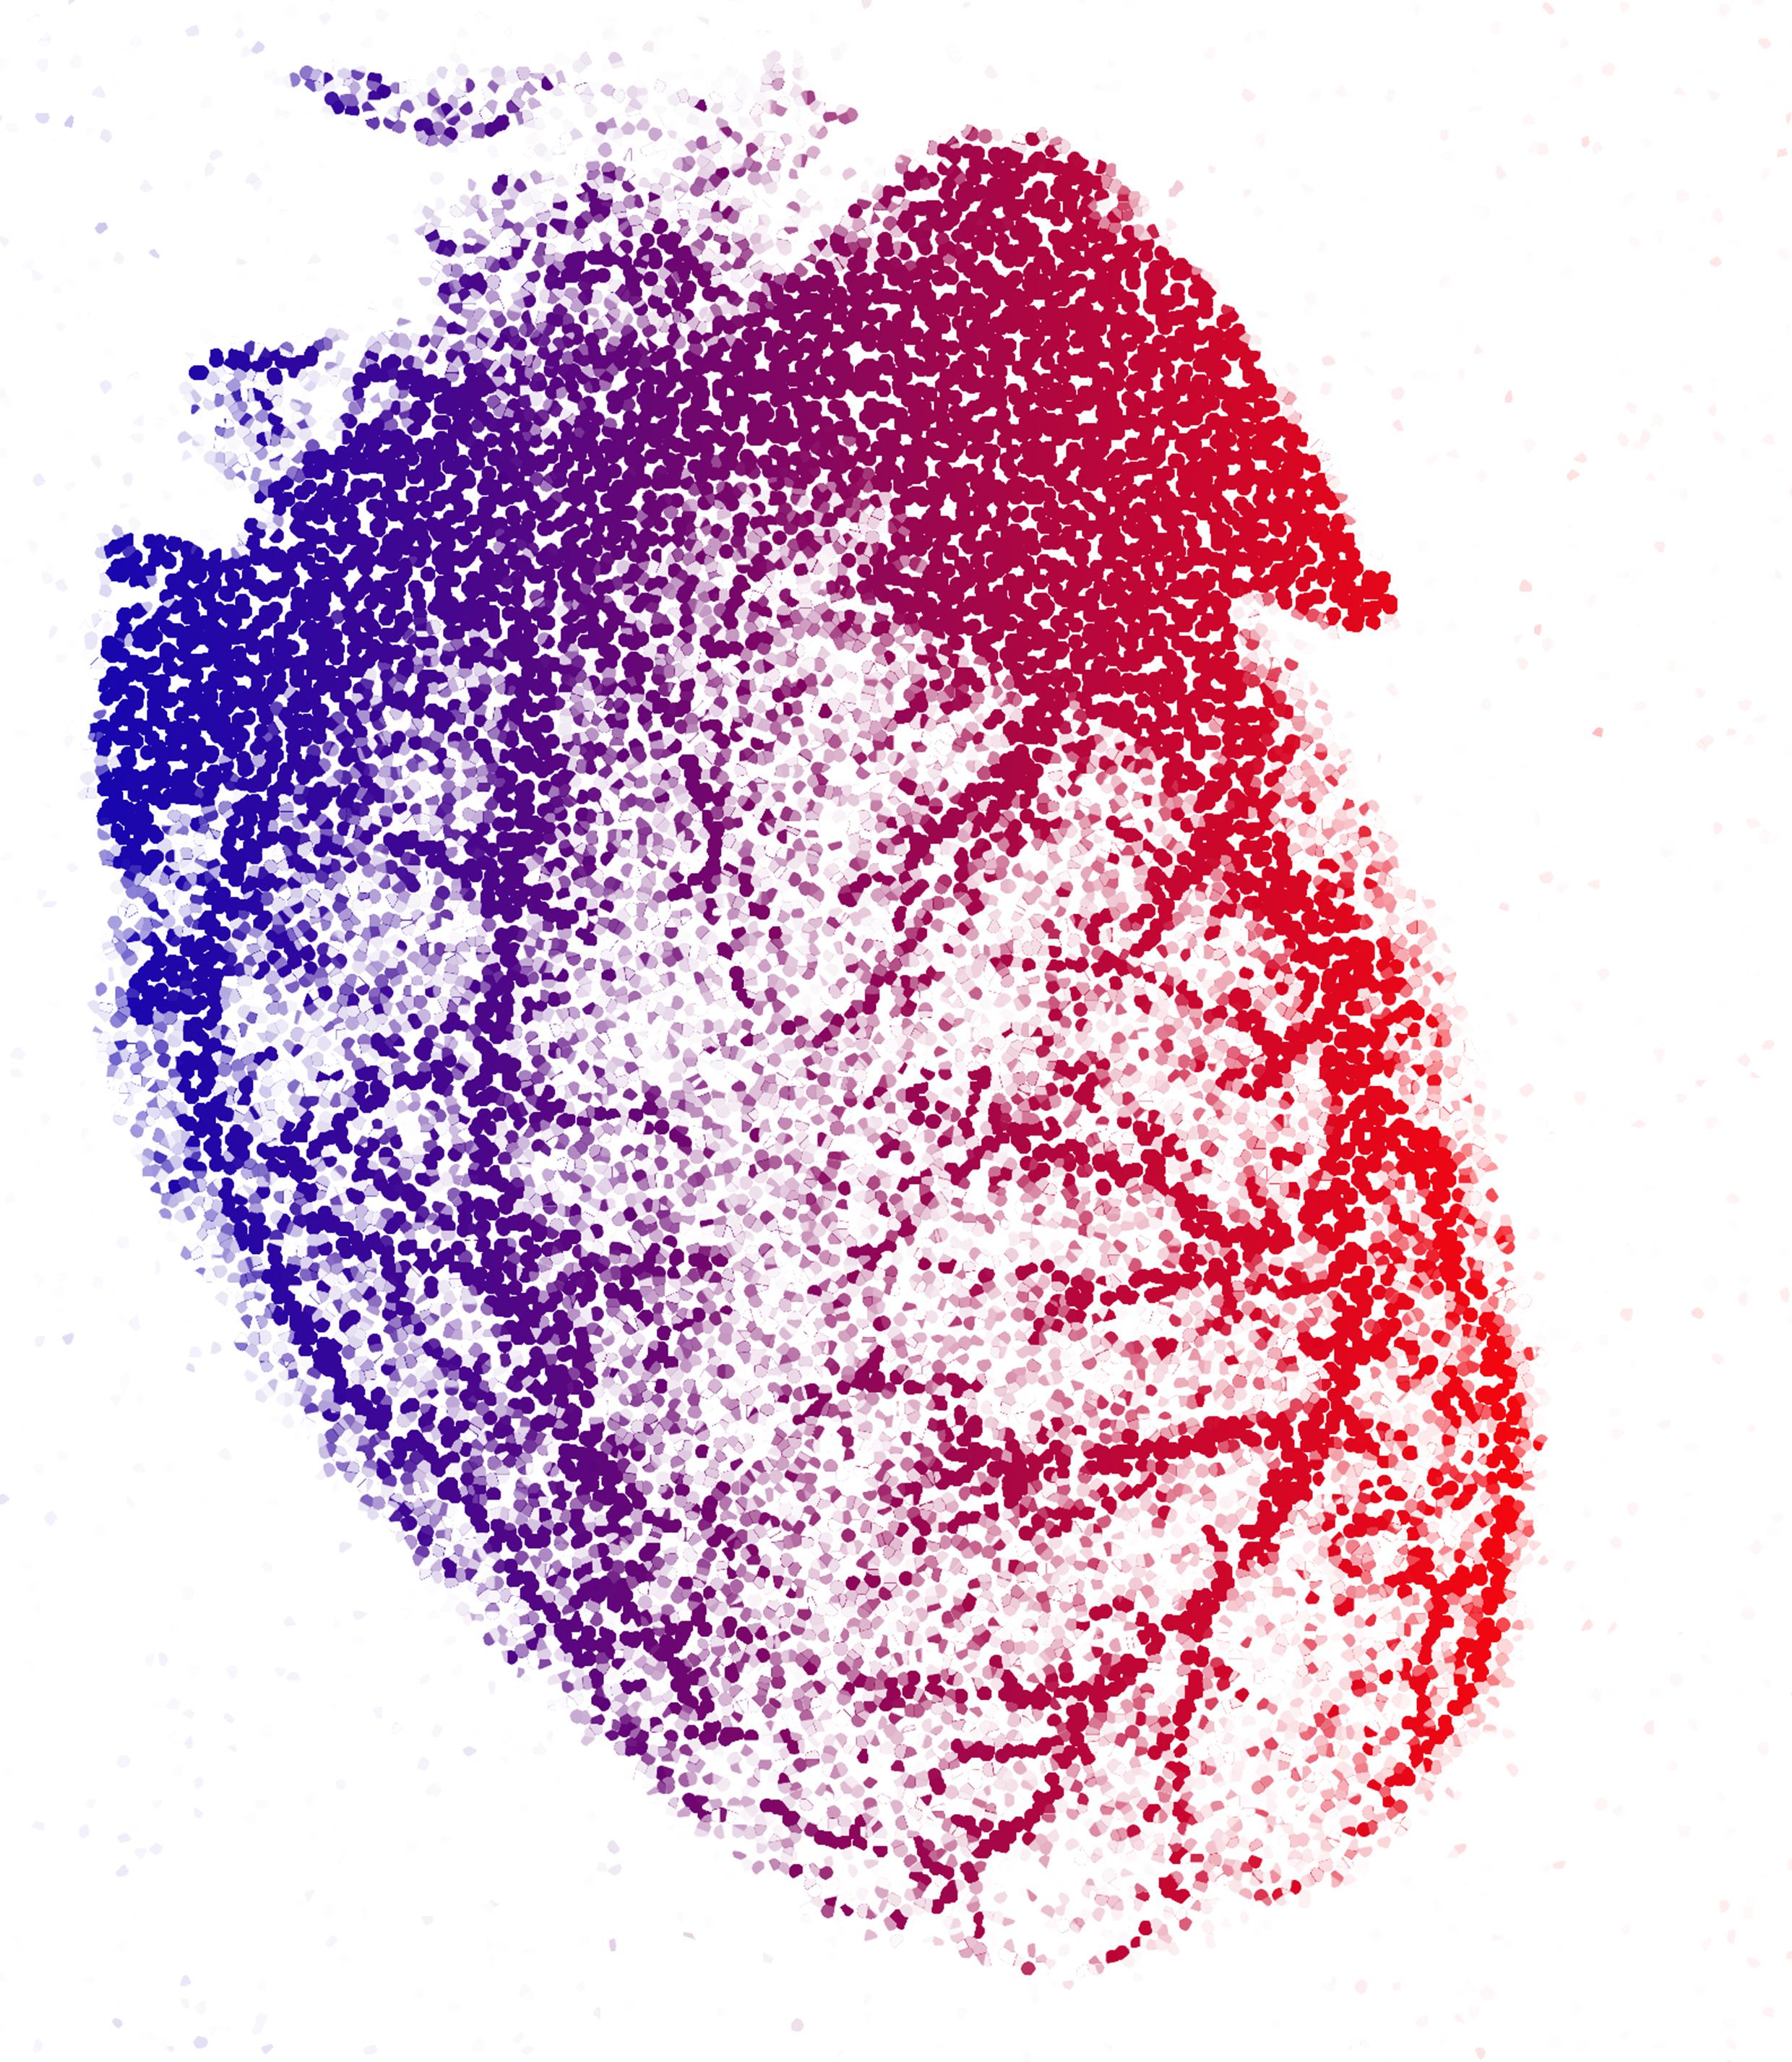 Pixilated coronary vessels B.jpg